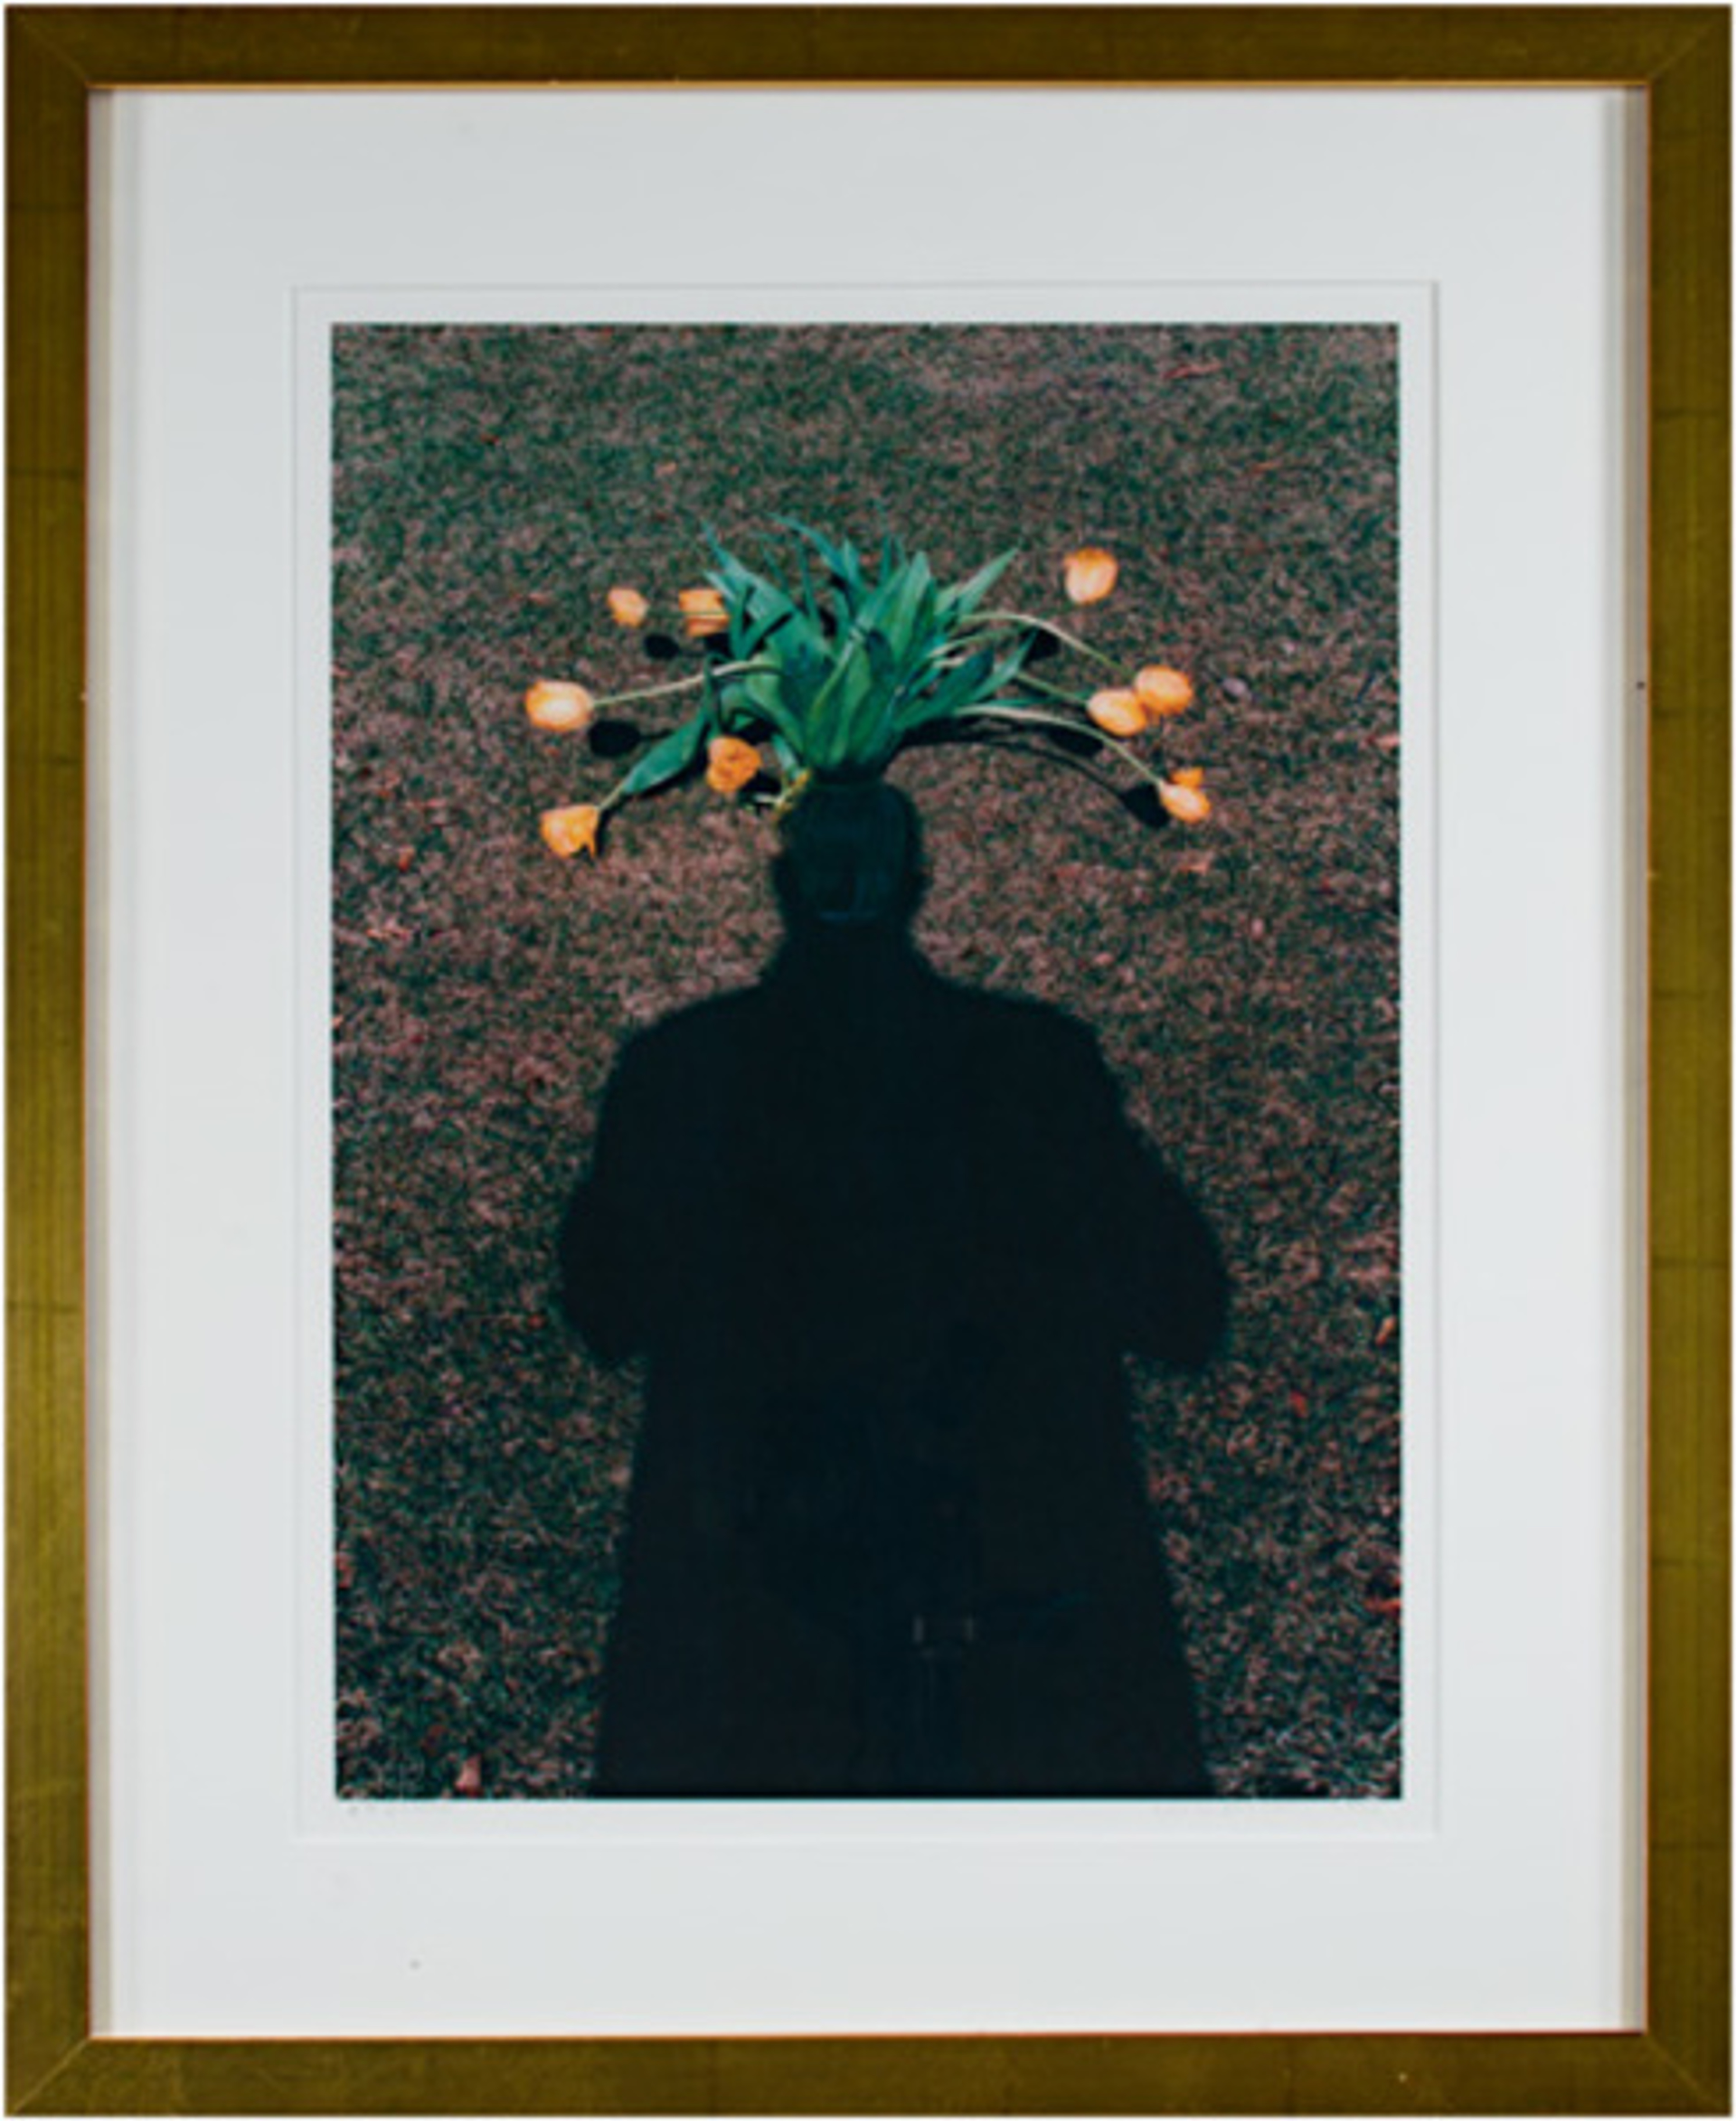 Self Portrait: Homage to Magritte - Tulip Top Headdress by David Barnett